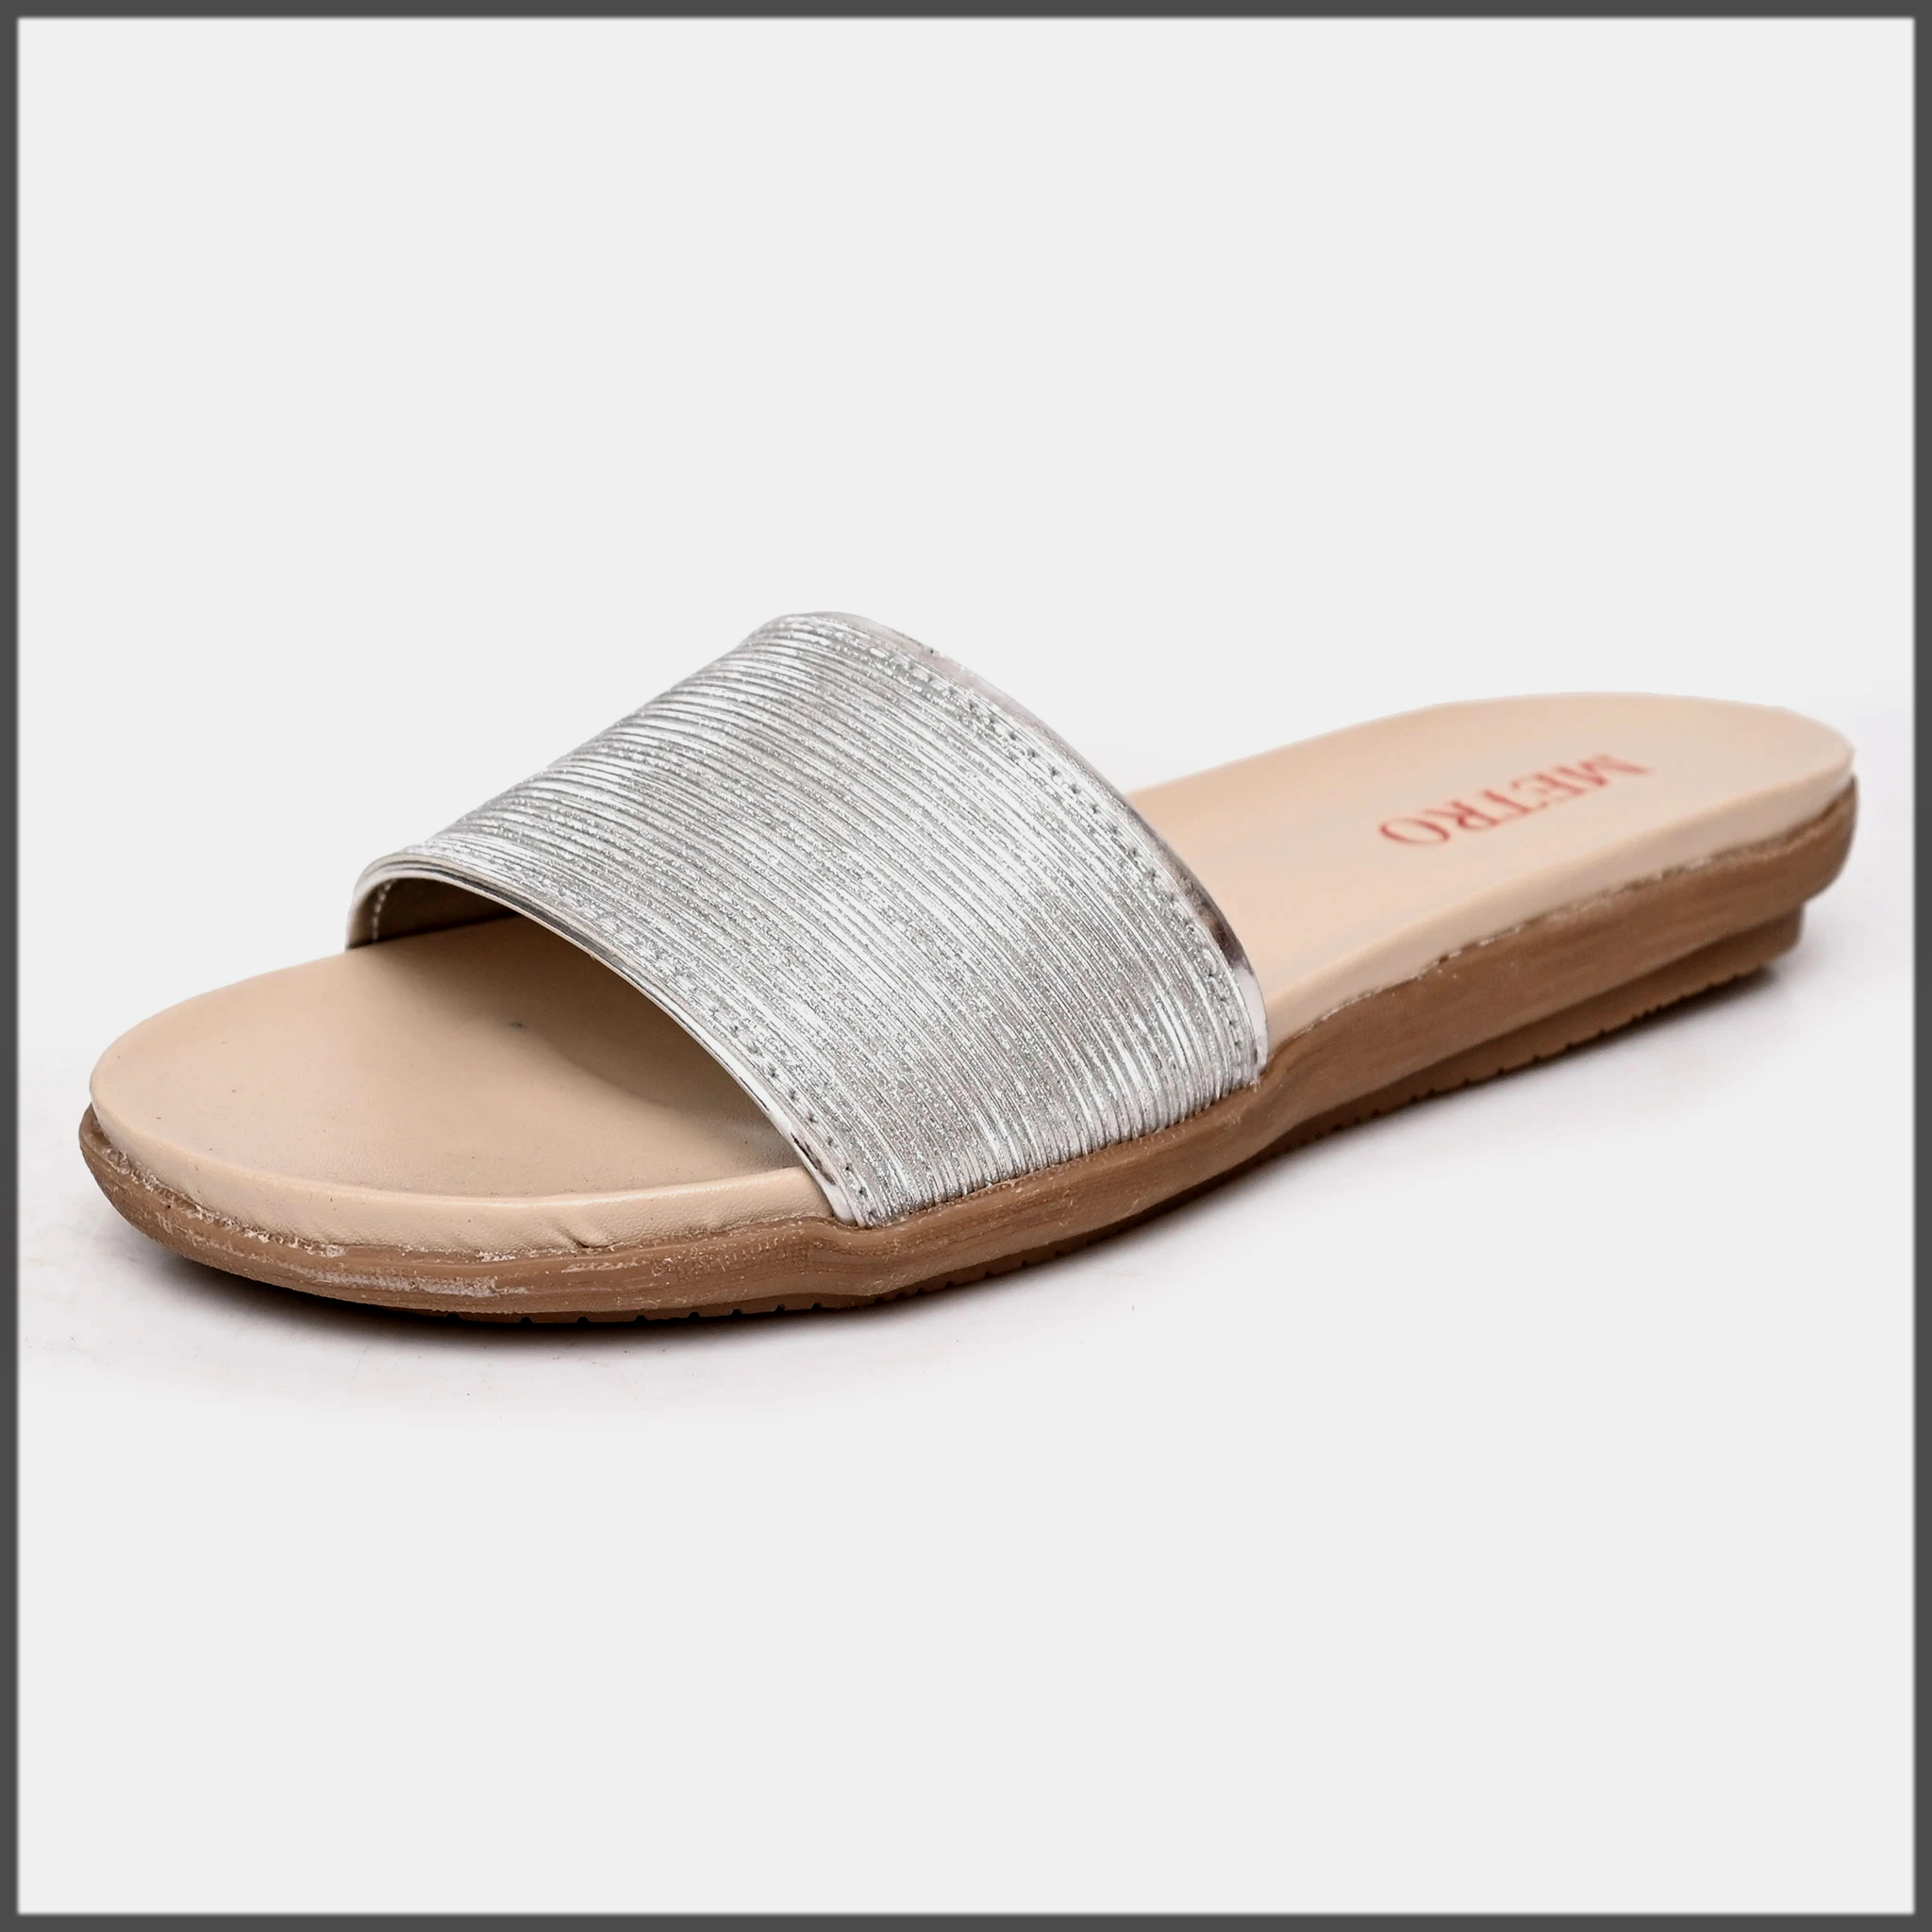 comfy home wear chappal